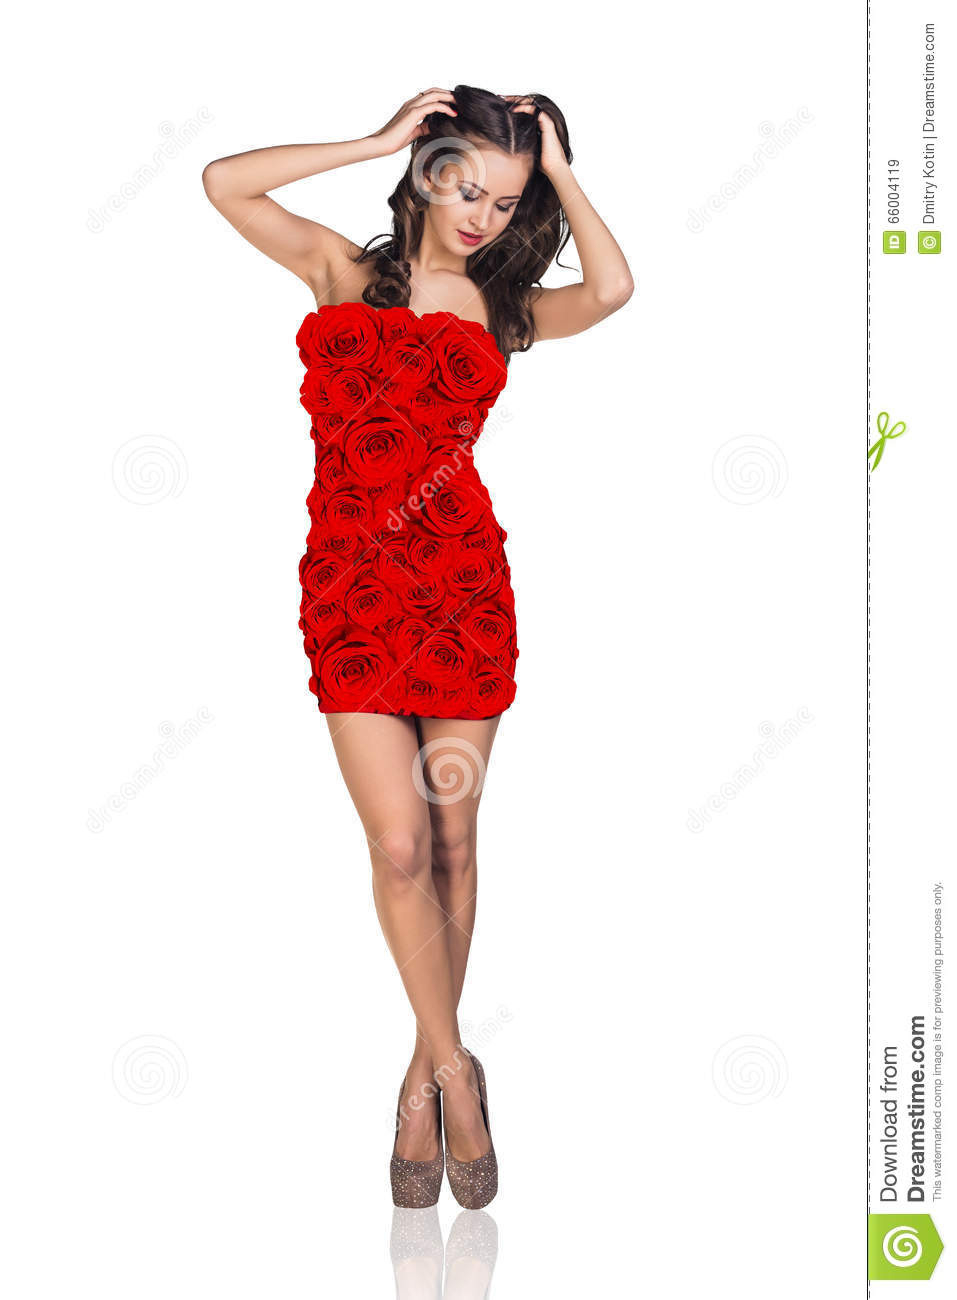 Frau Im Kleid Mit Rosenmuster Stockbild  Bild Von